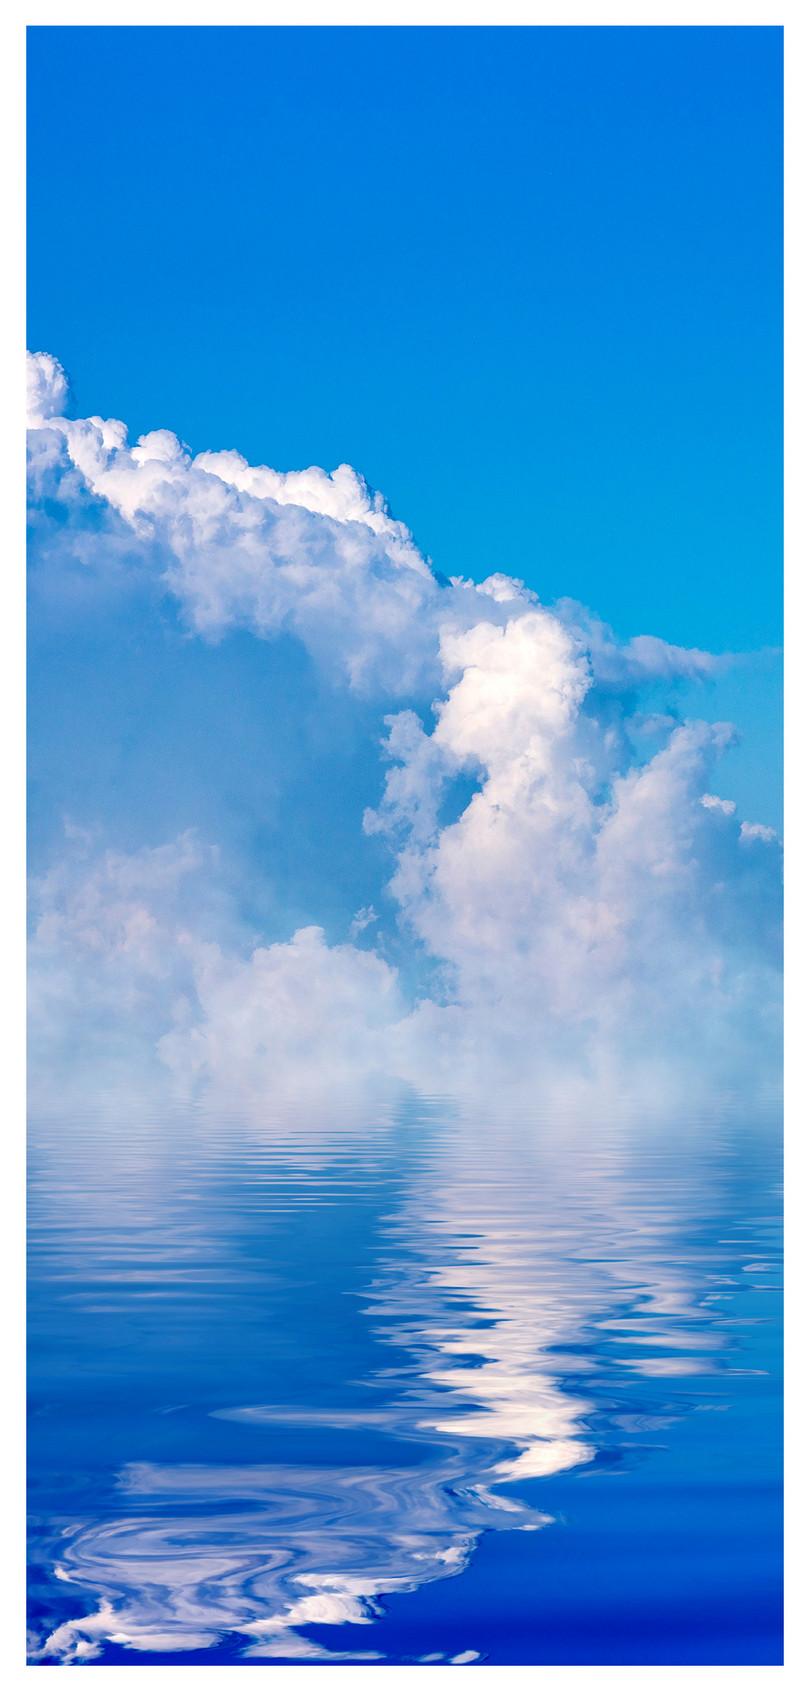 wallpaper awan hd,sky,cloud,blue,daytime,cumulus,azure,aqua,calm ...